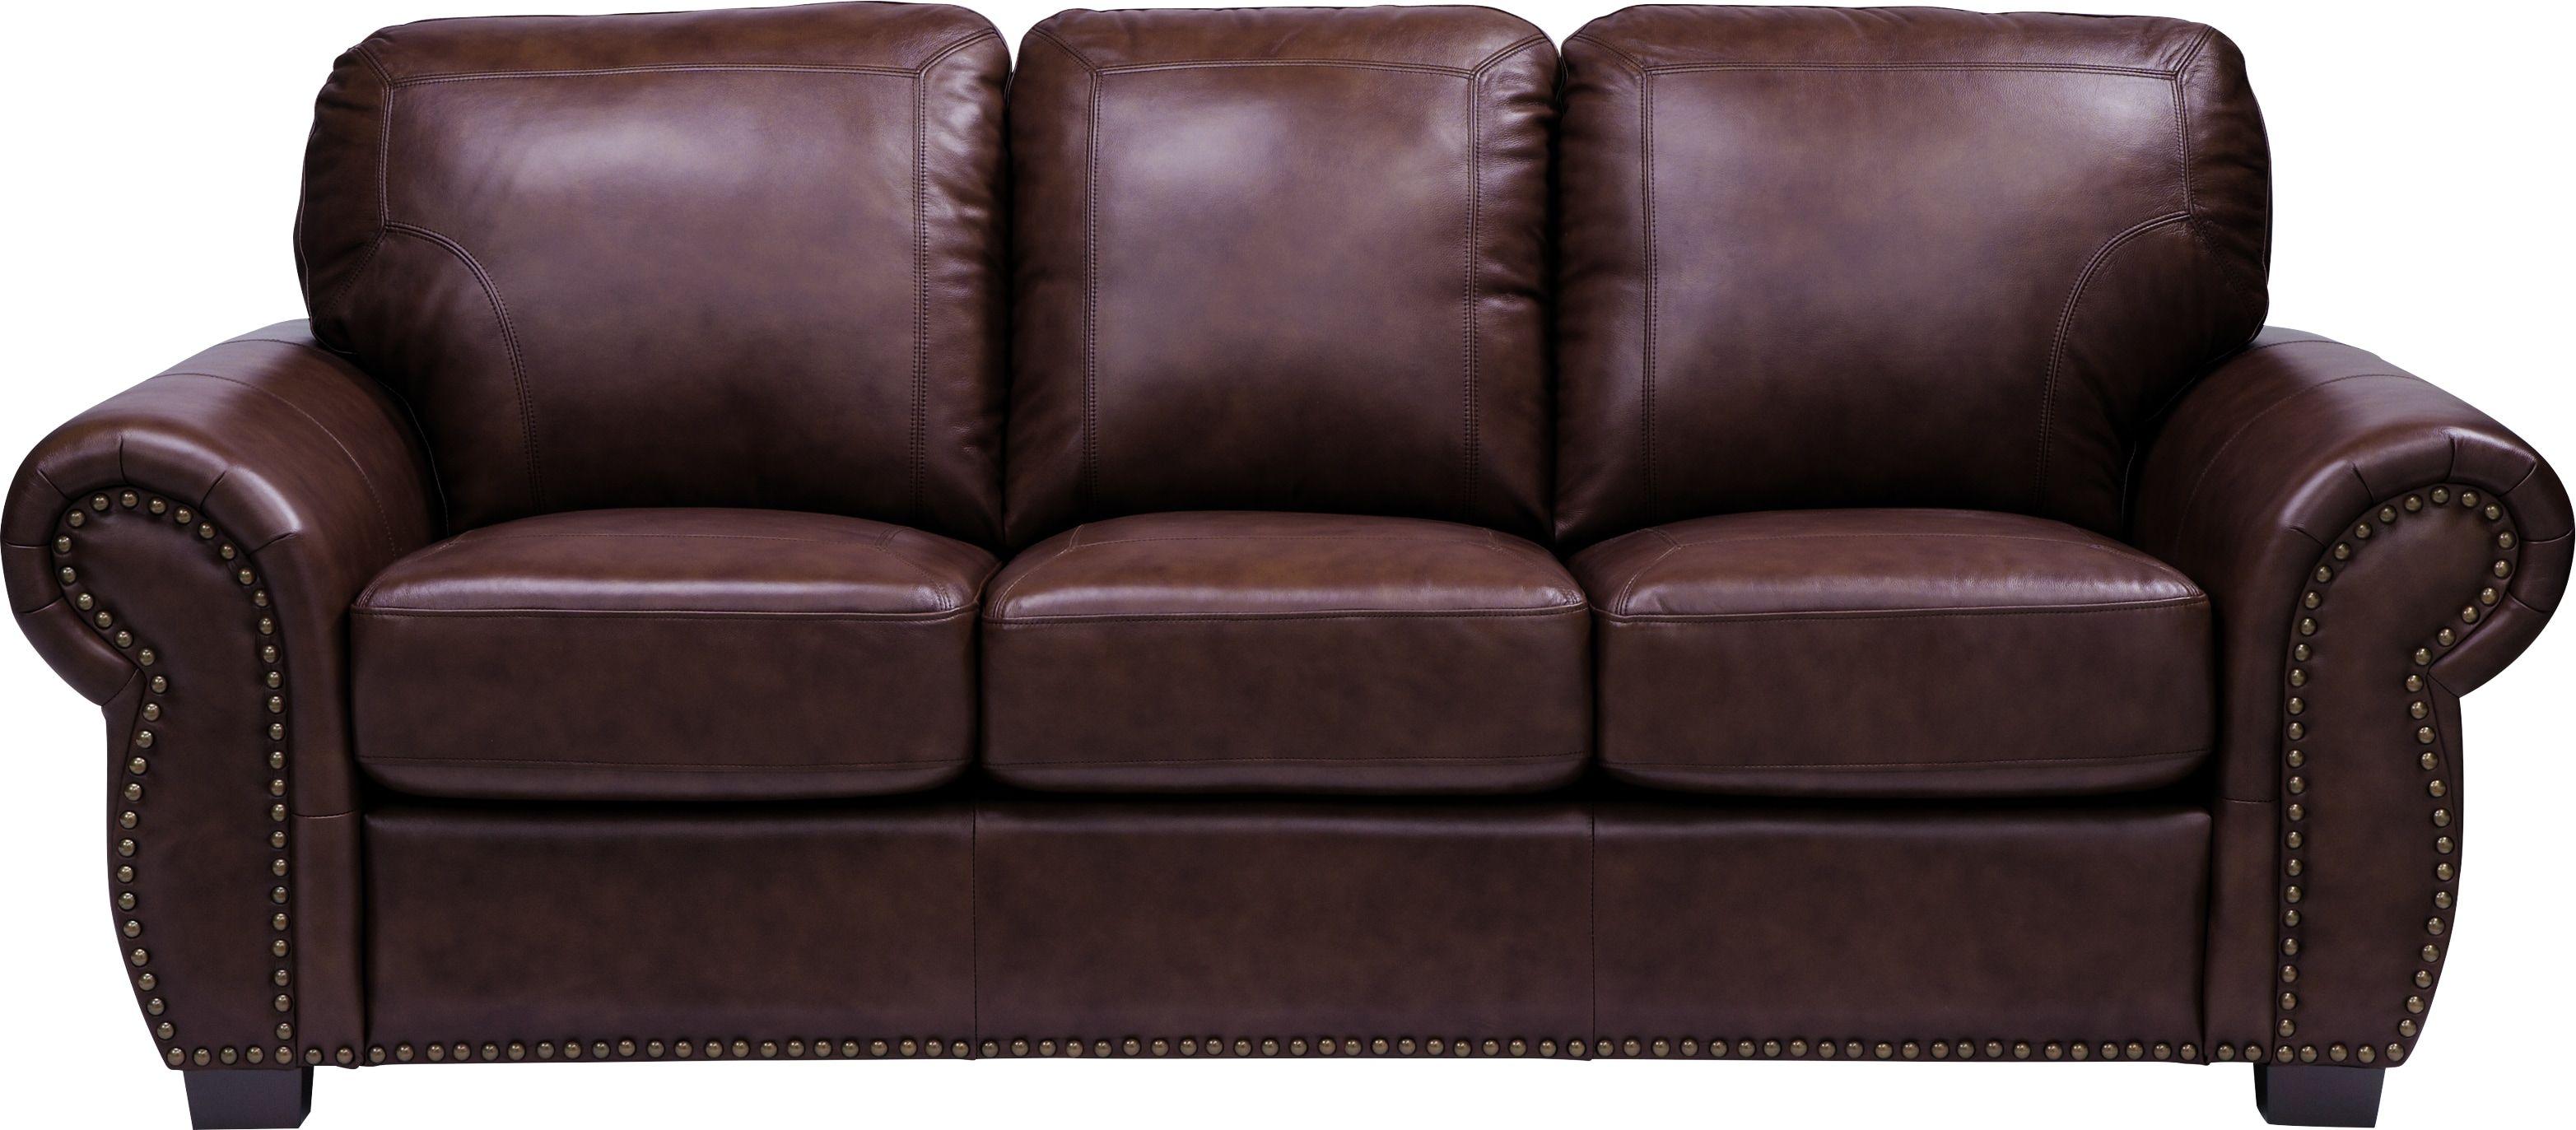 Balencia Dark Brown Leather Sofa Dark Brown Leather Sofa Brown Leather Sofa Leather Sofa